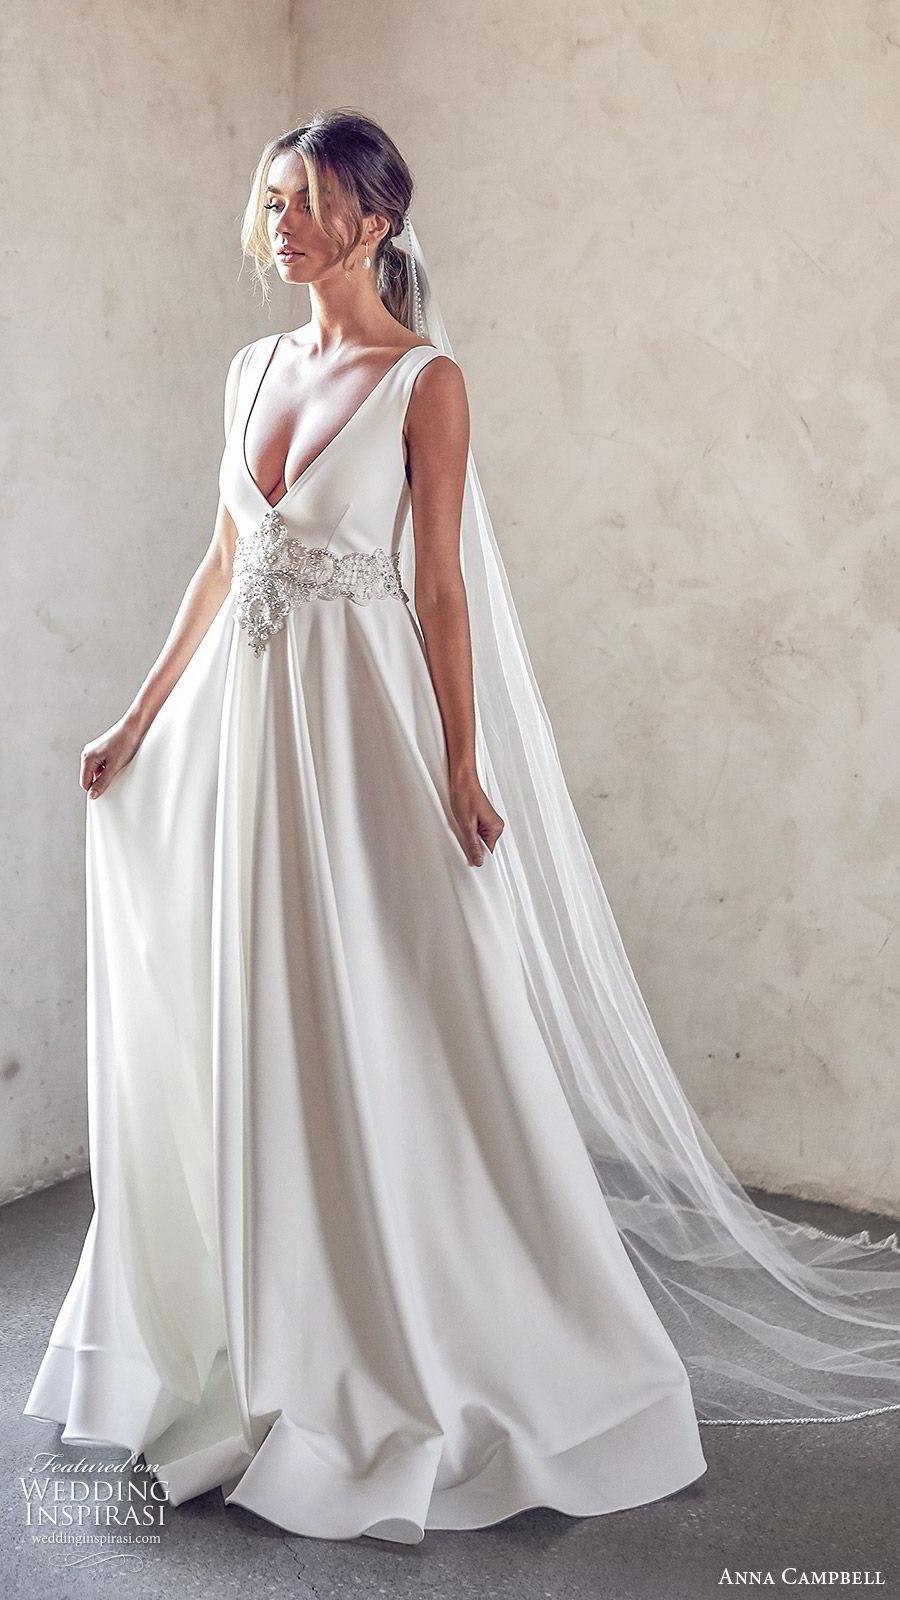 anna campbell 2020 bridal sleeveless thick straps deep v neckline embellished waist ball gown a line wedding dress (7) elegant sexy clean modern open back chapel train sv